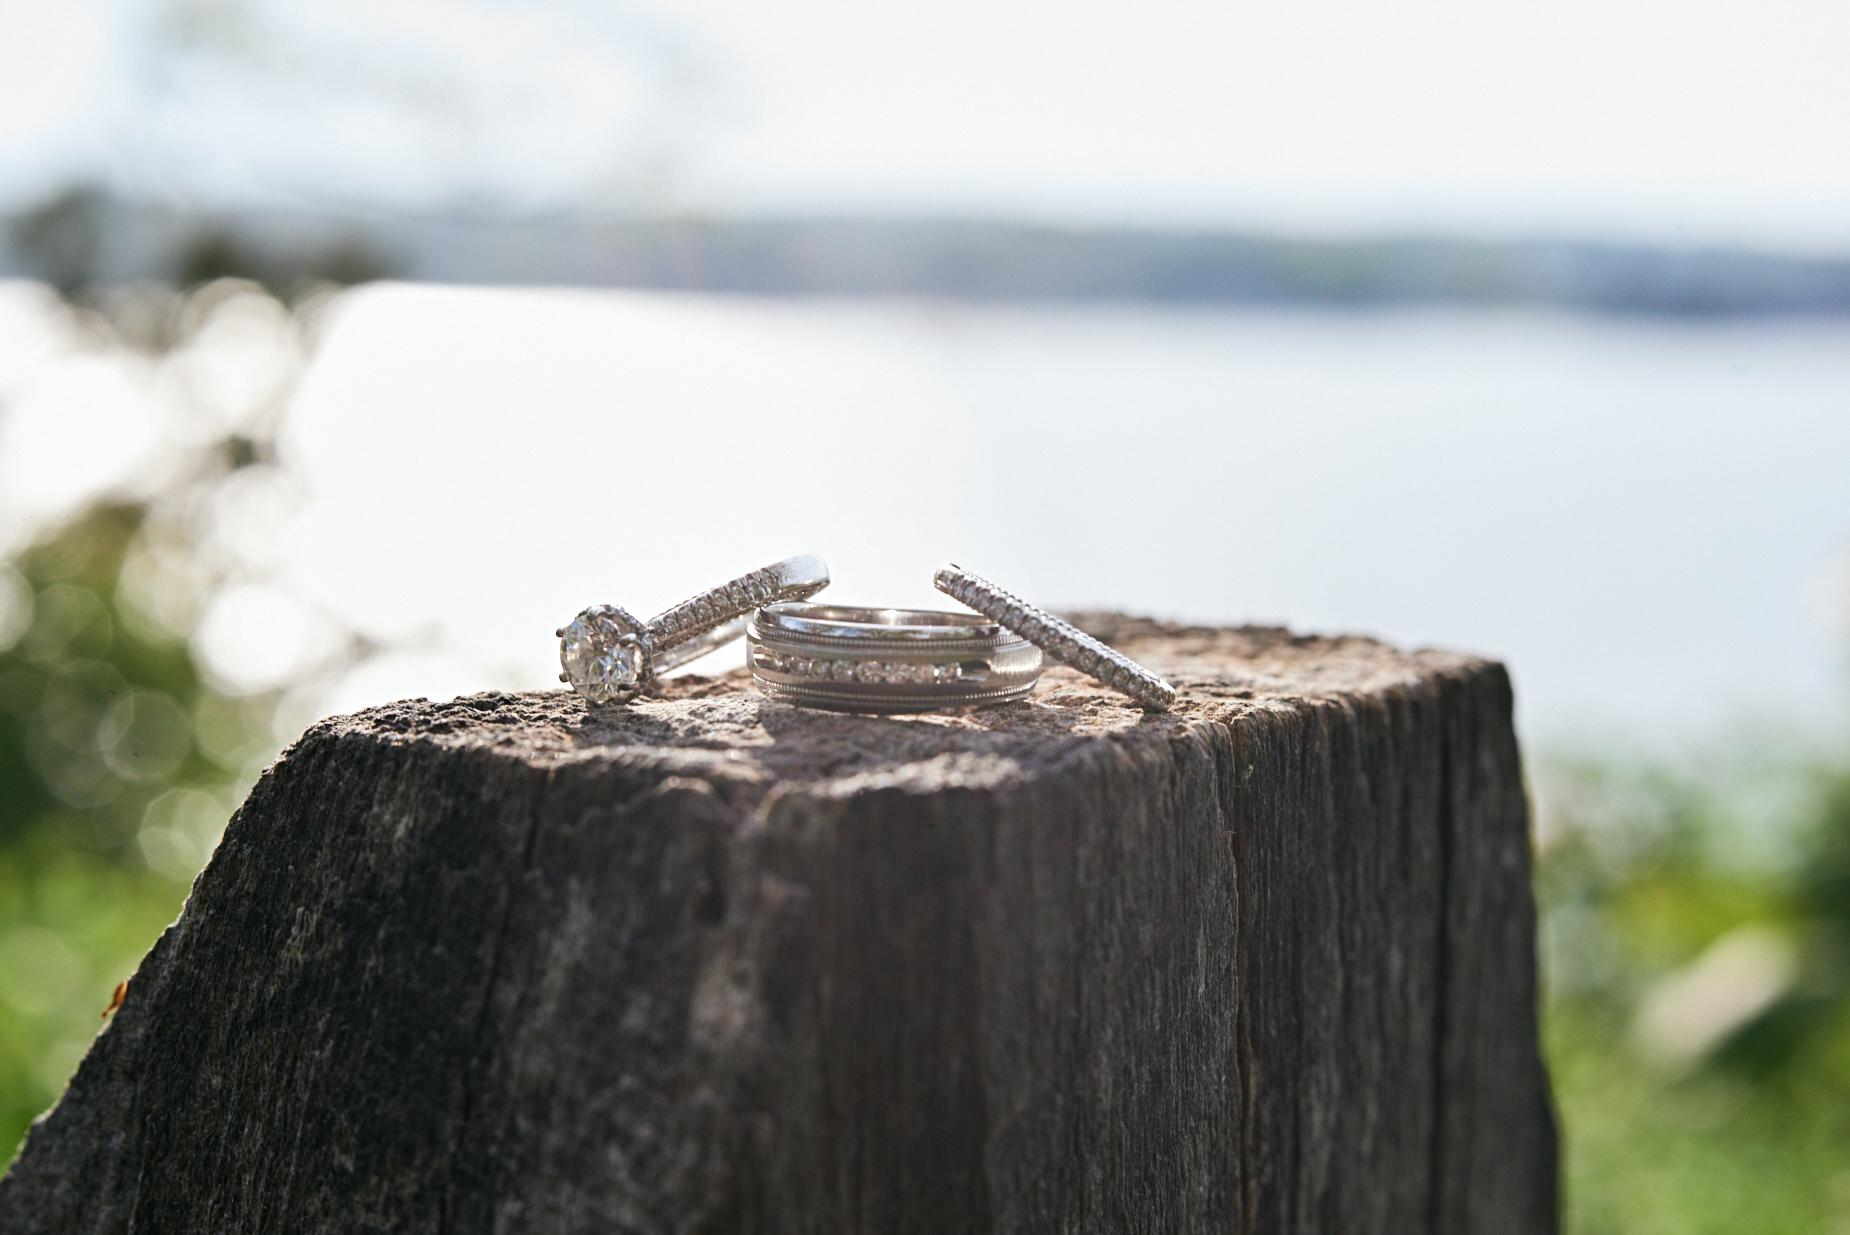 WEDDING PHOTOGRAPHY / Martha's Vineyard Dream Destination Wedding at Sailing Camp Park in Oak Bluffs, MA